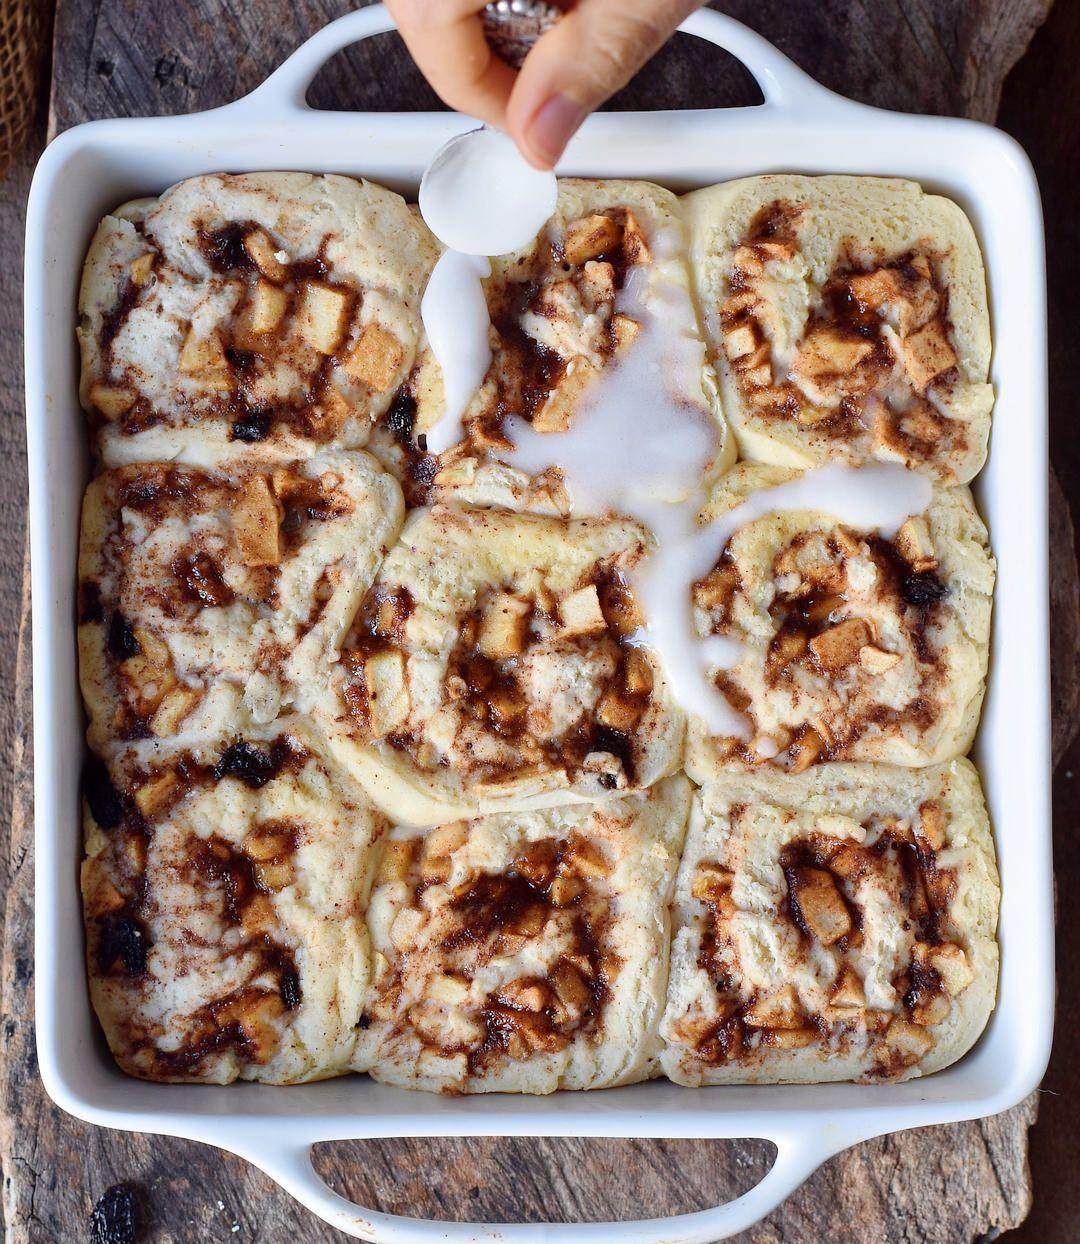 Vegan And Gluten Free Apple Cinnamon Rolls These Cinnamon Buns